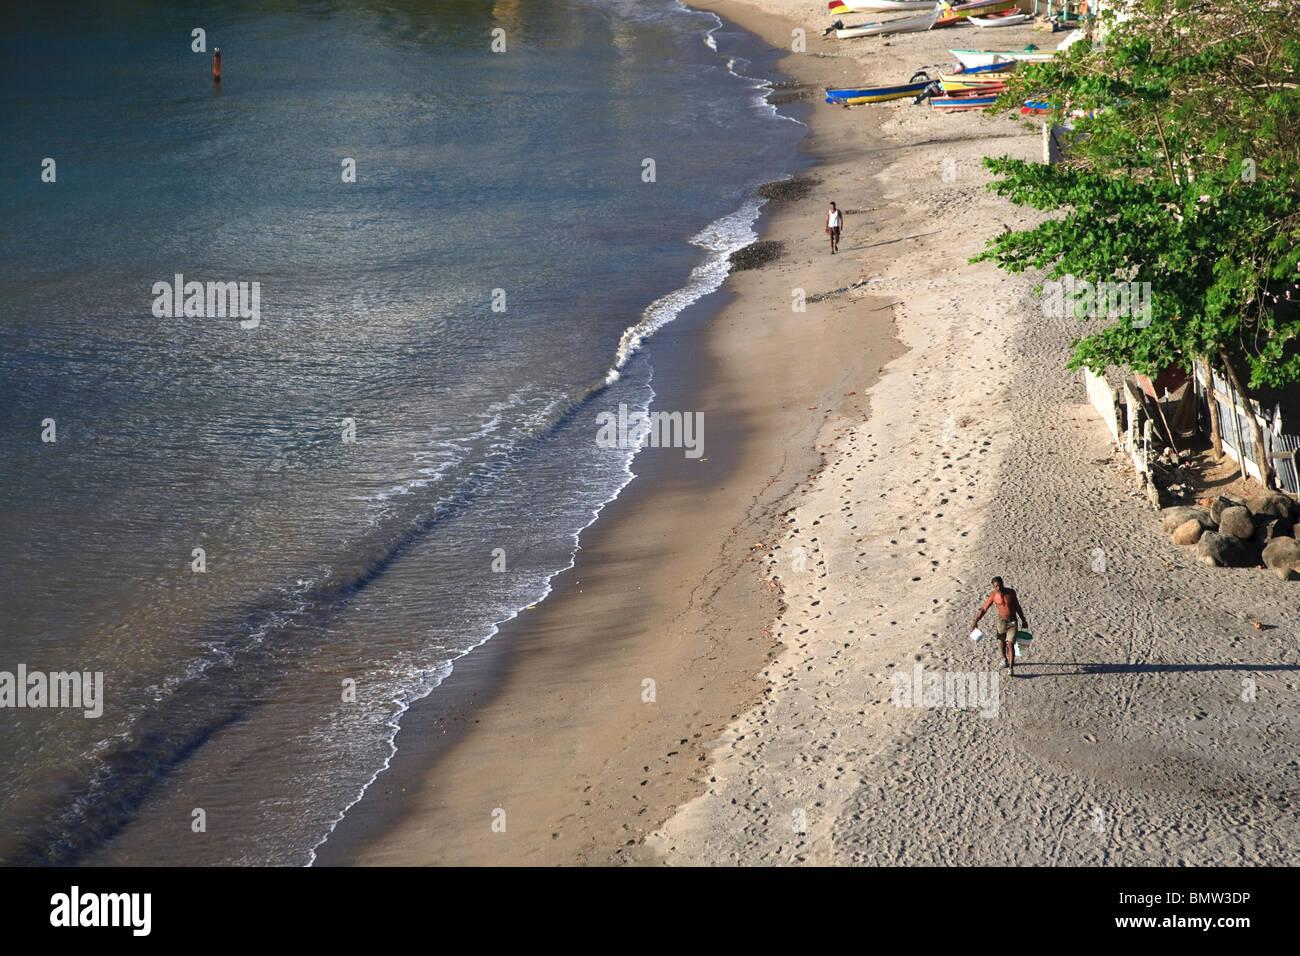 Caribbean, St Lucia, Anse La Raye Village and Beach Stock Photo